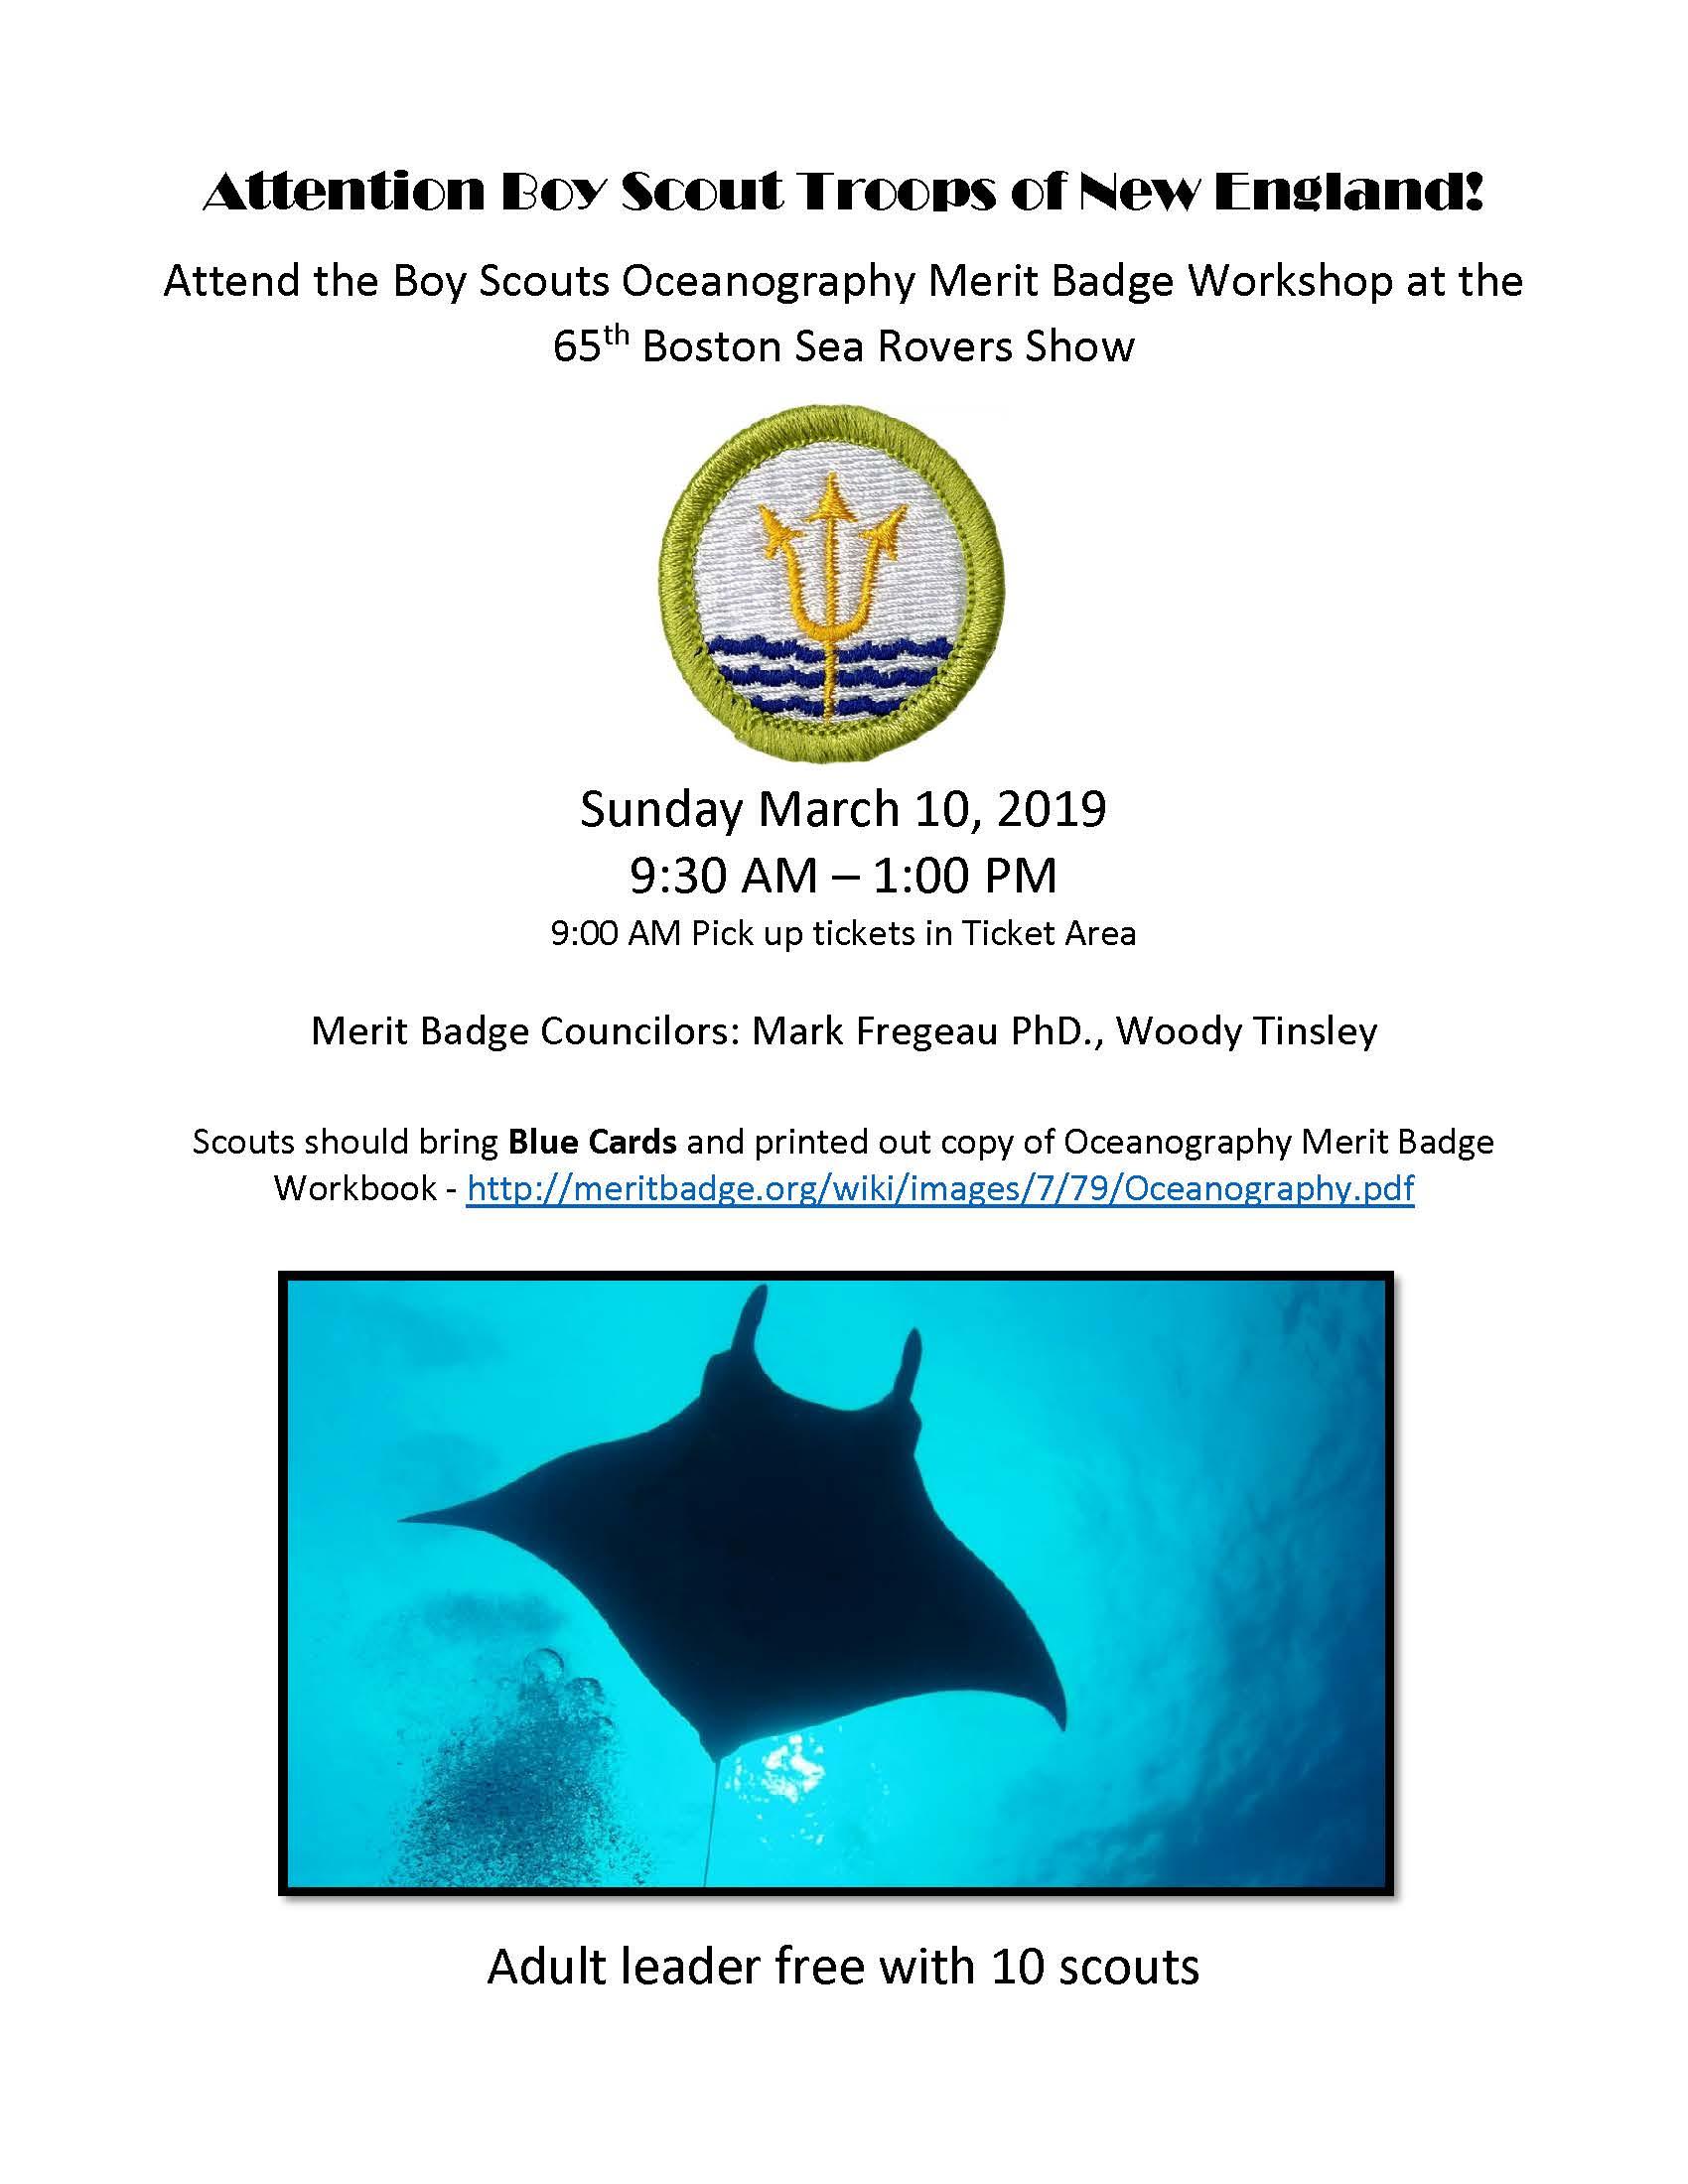 Boy Scouts Oceanography Merit Badge